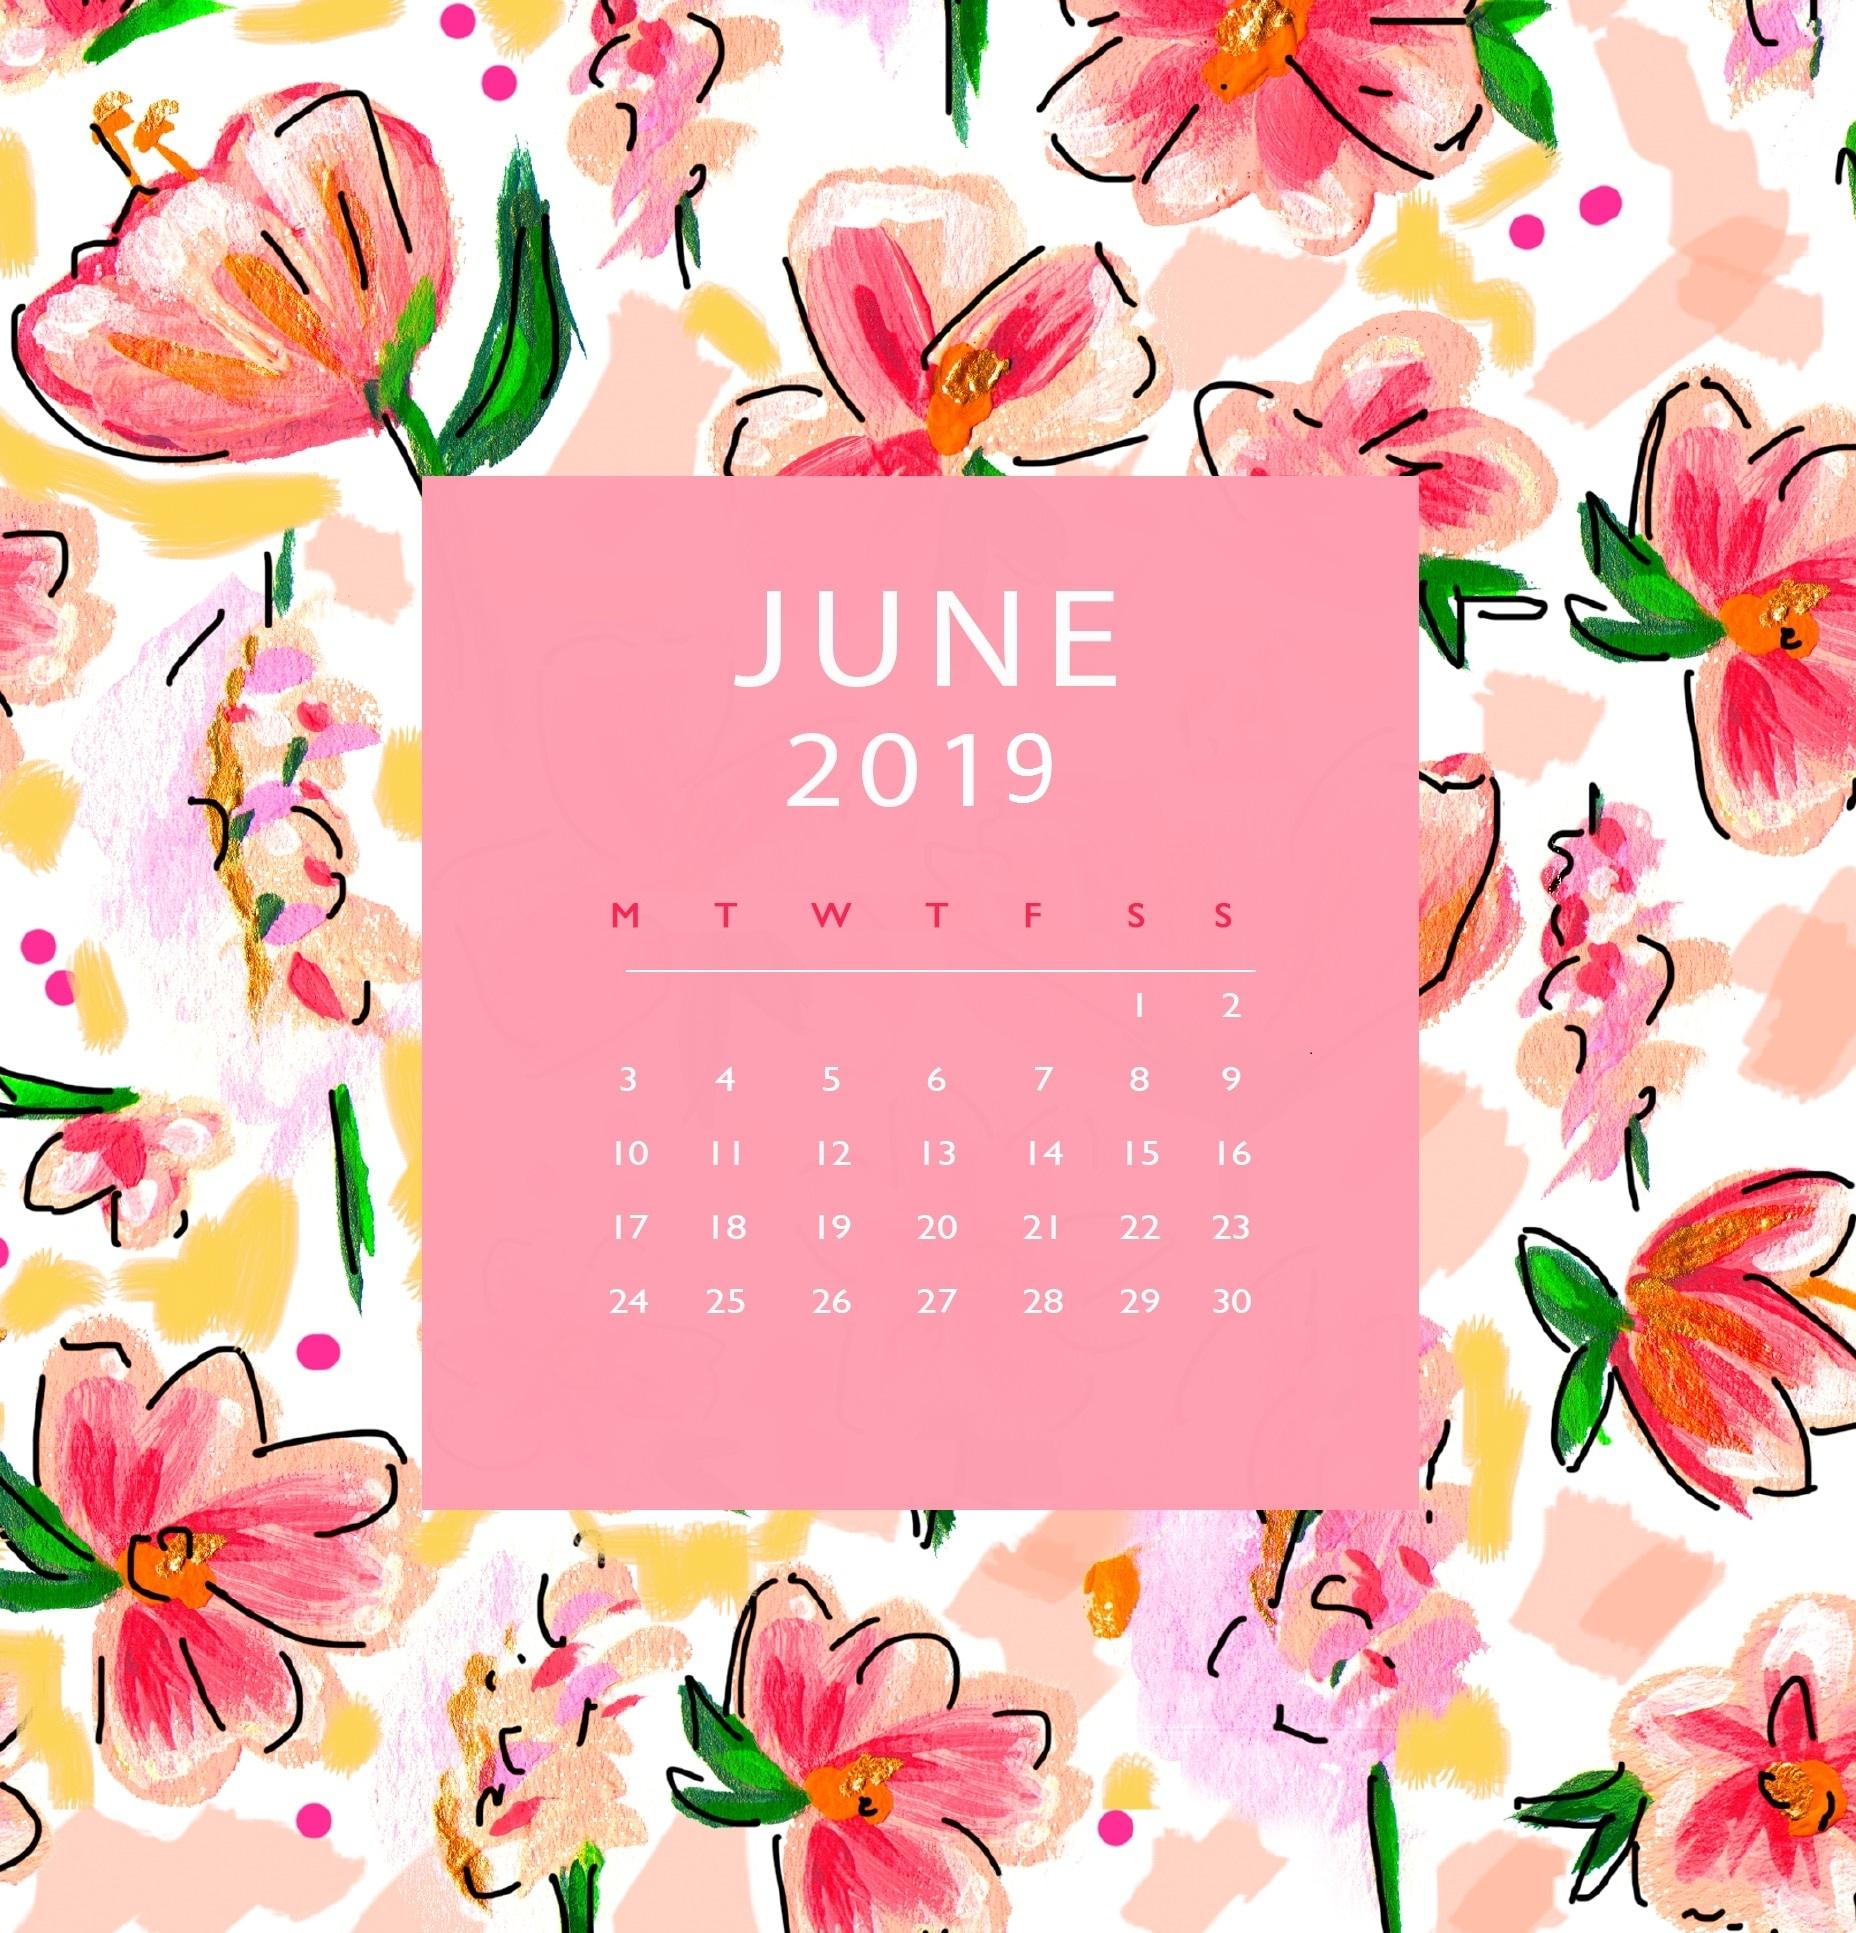 june 2019 iphone calendar wallpaper::June 2019 iPhone Calendar Wallpaper